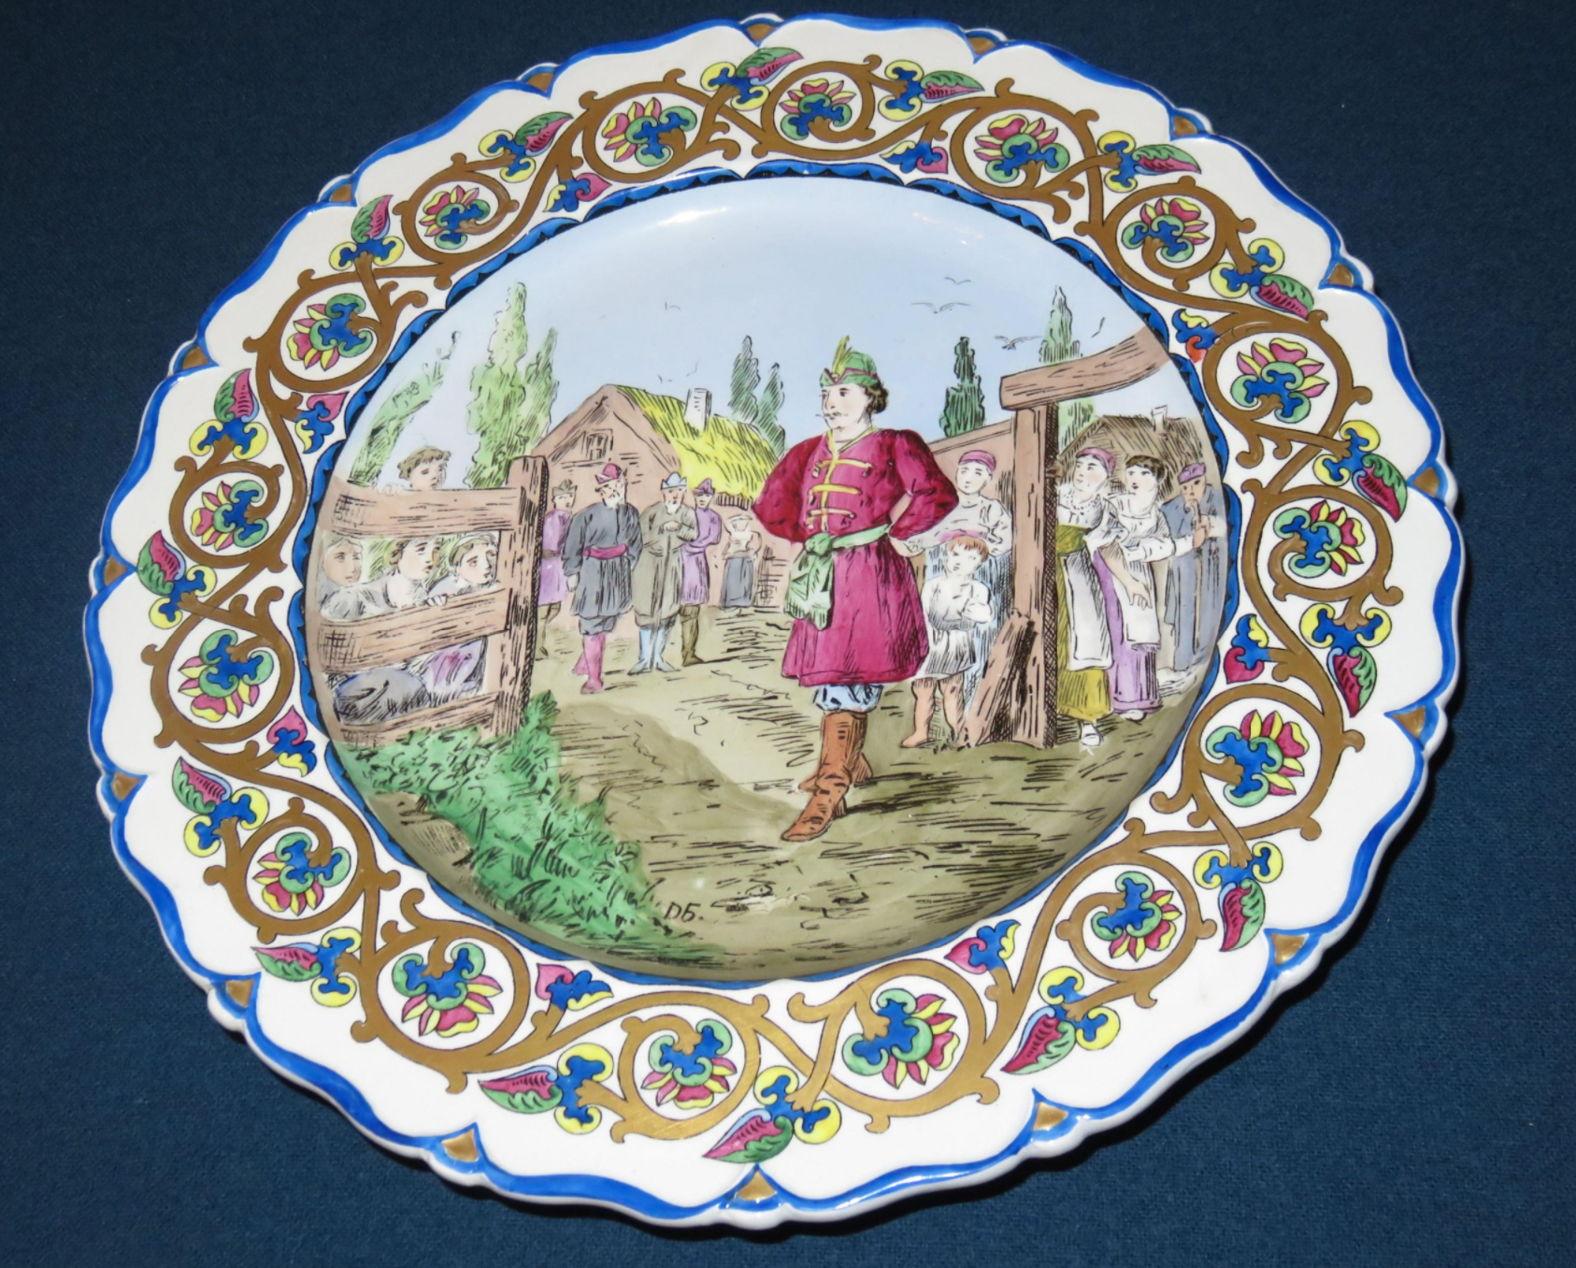 Тарелка «Былина Чурила Пленкович» Заводы М.С. Кузнецова. 1870-е-1889гг.